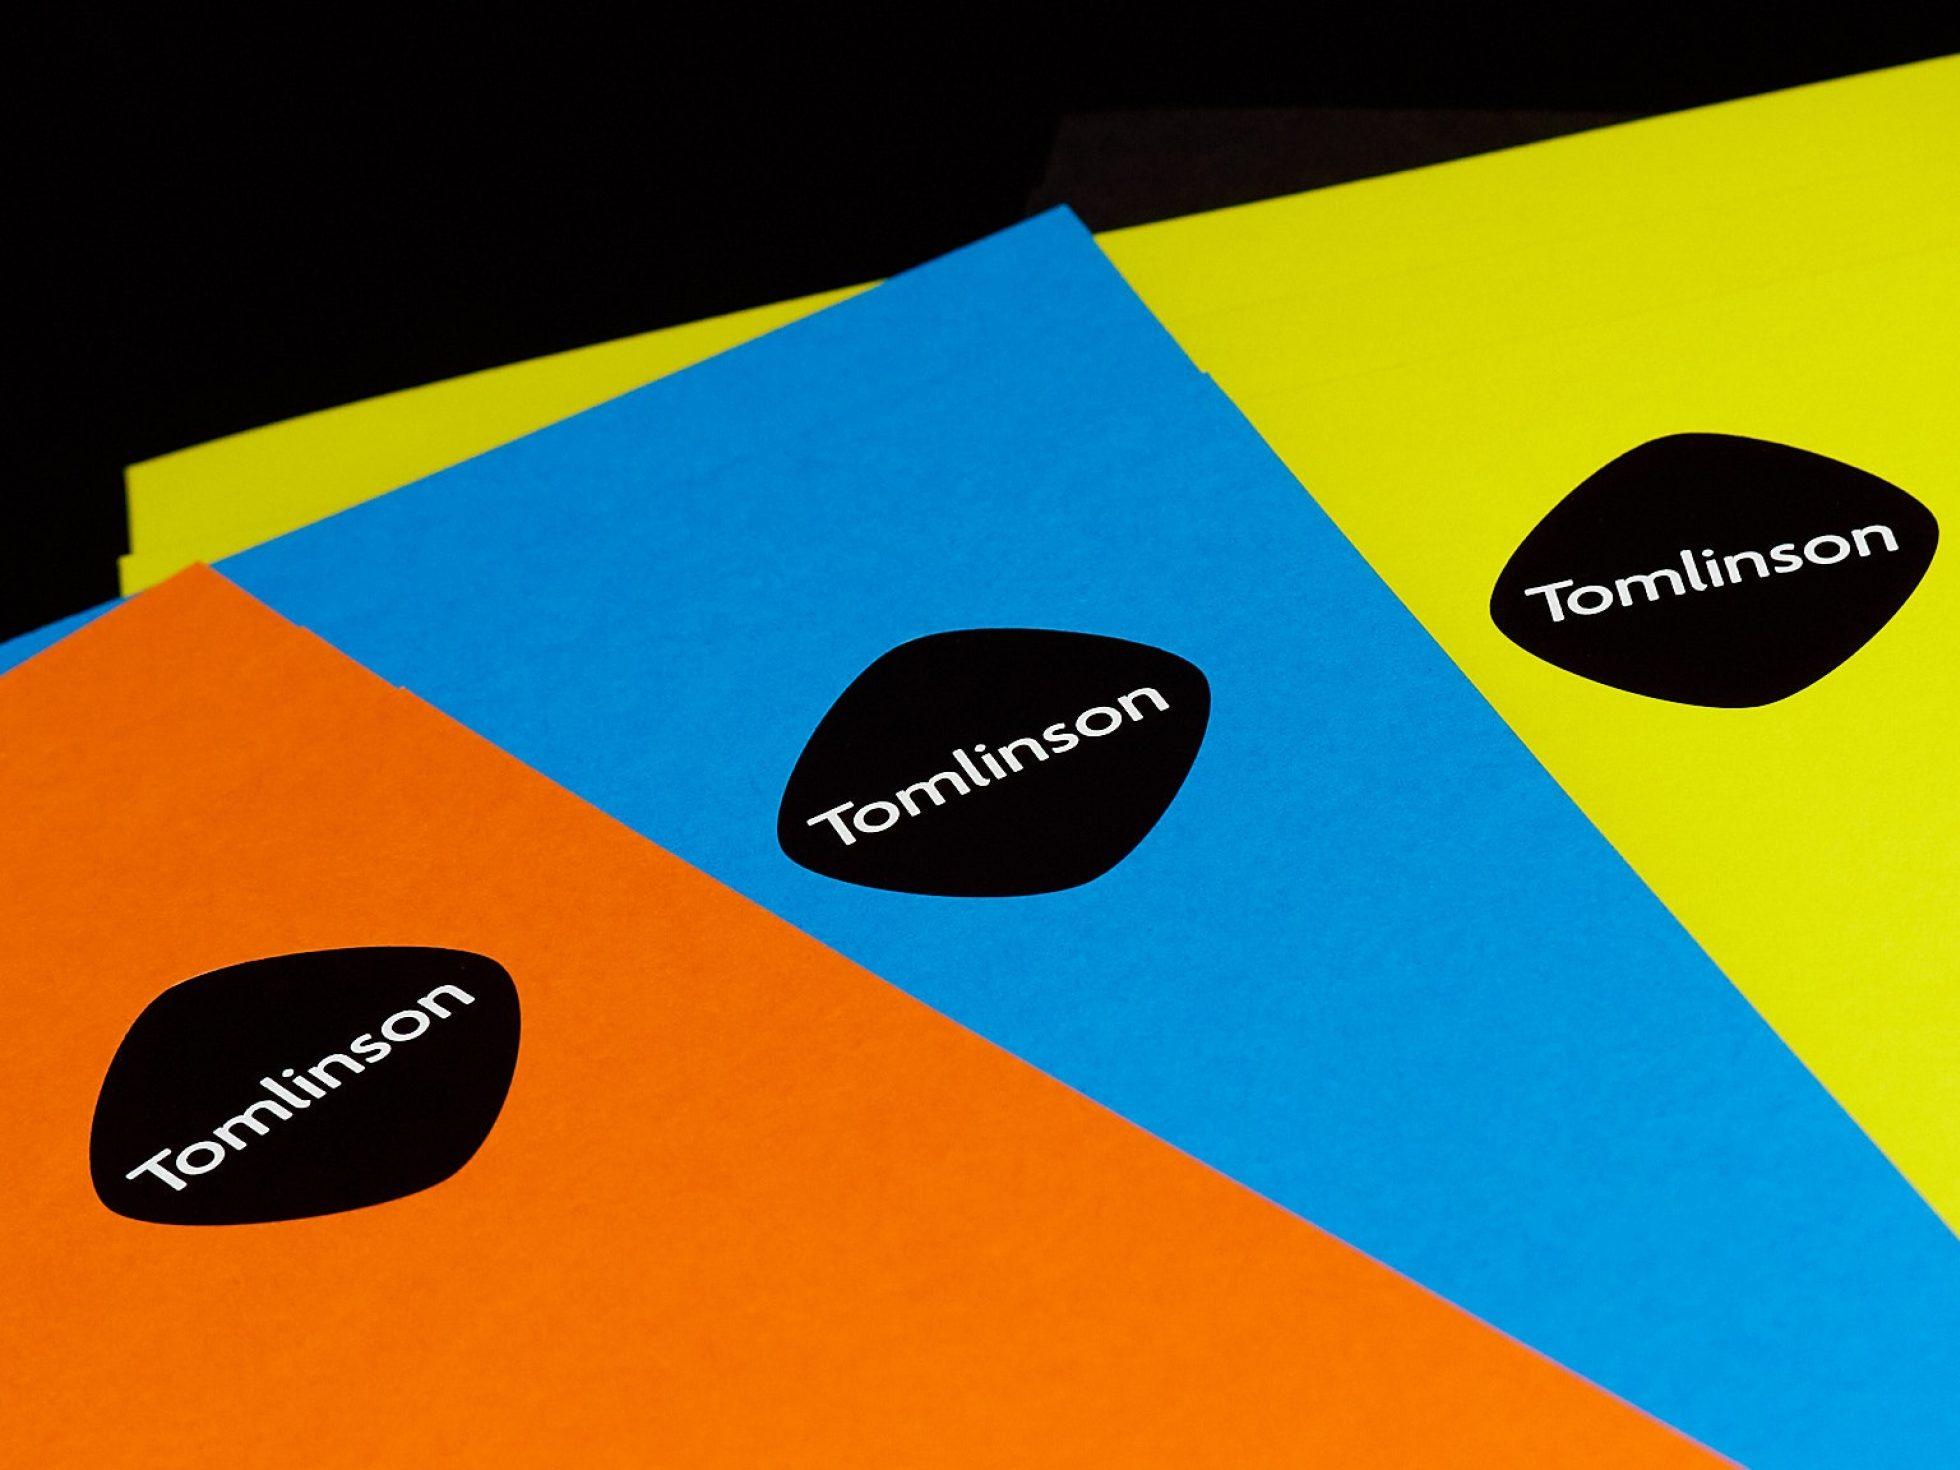 Tomlinson rebranding